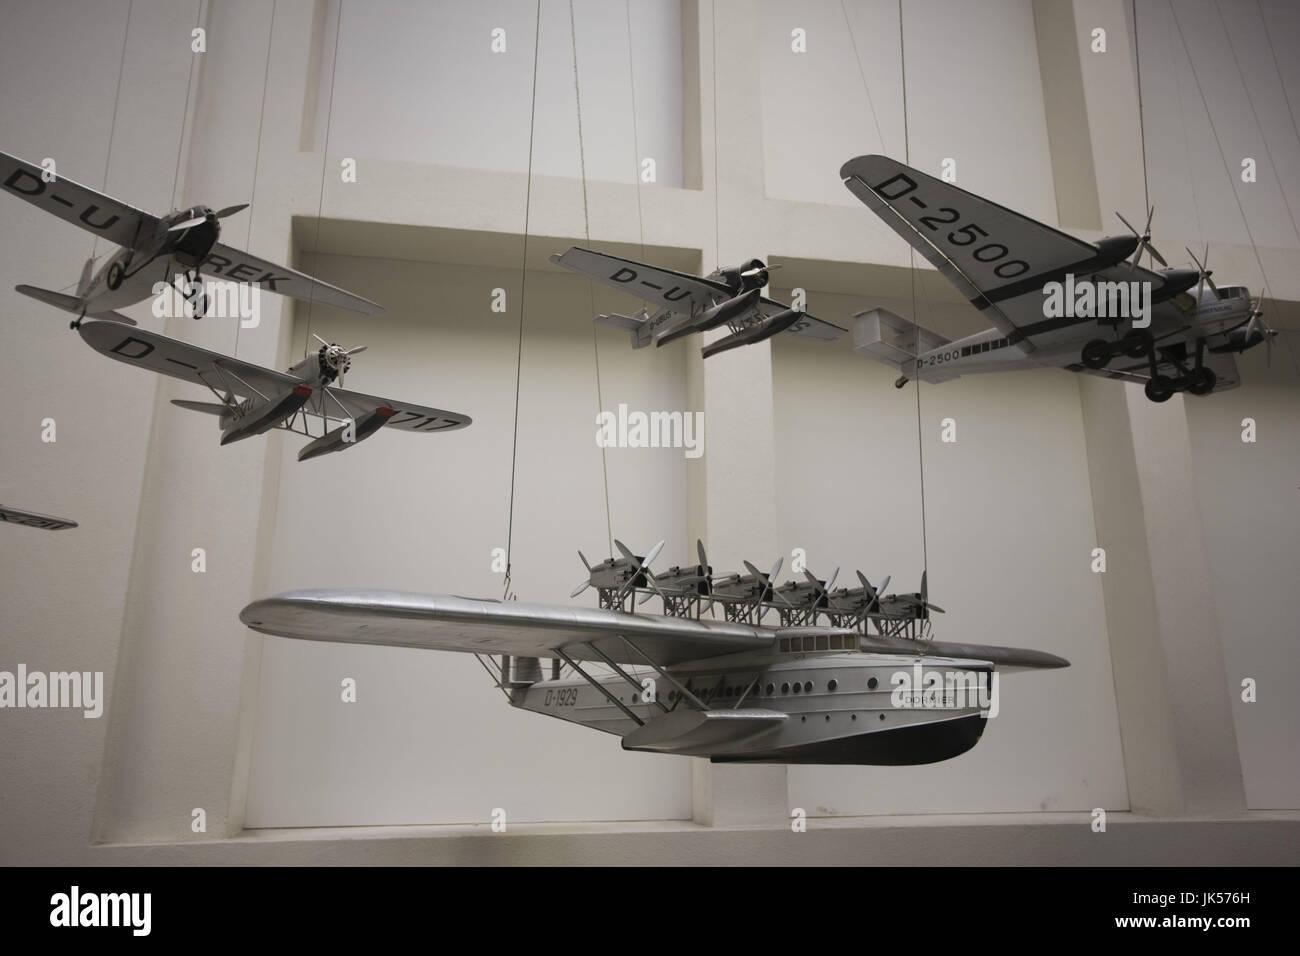 Germany, Bavaria, Munich, Deutsches Museum, Aviation Section, 1930s Dornier DO-X Flying Boat, - Stock Image